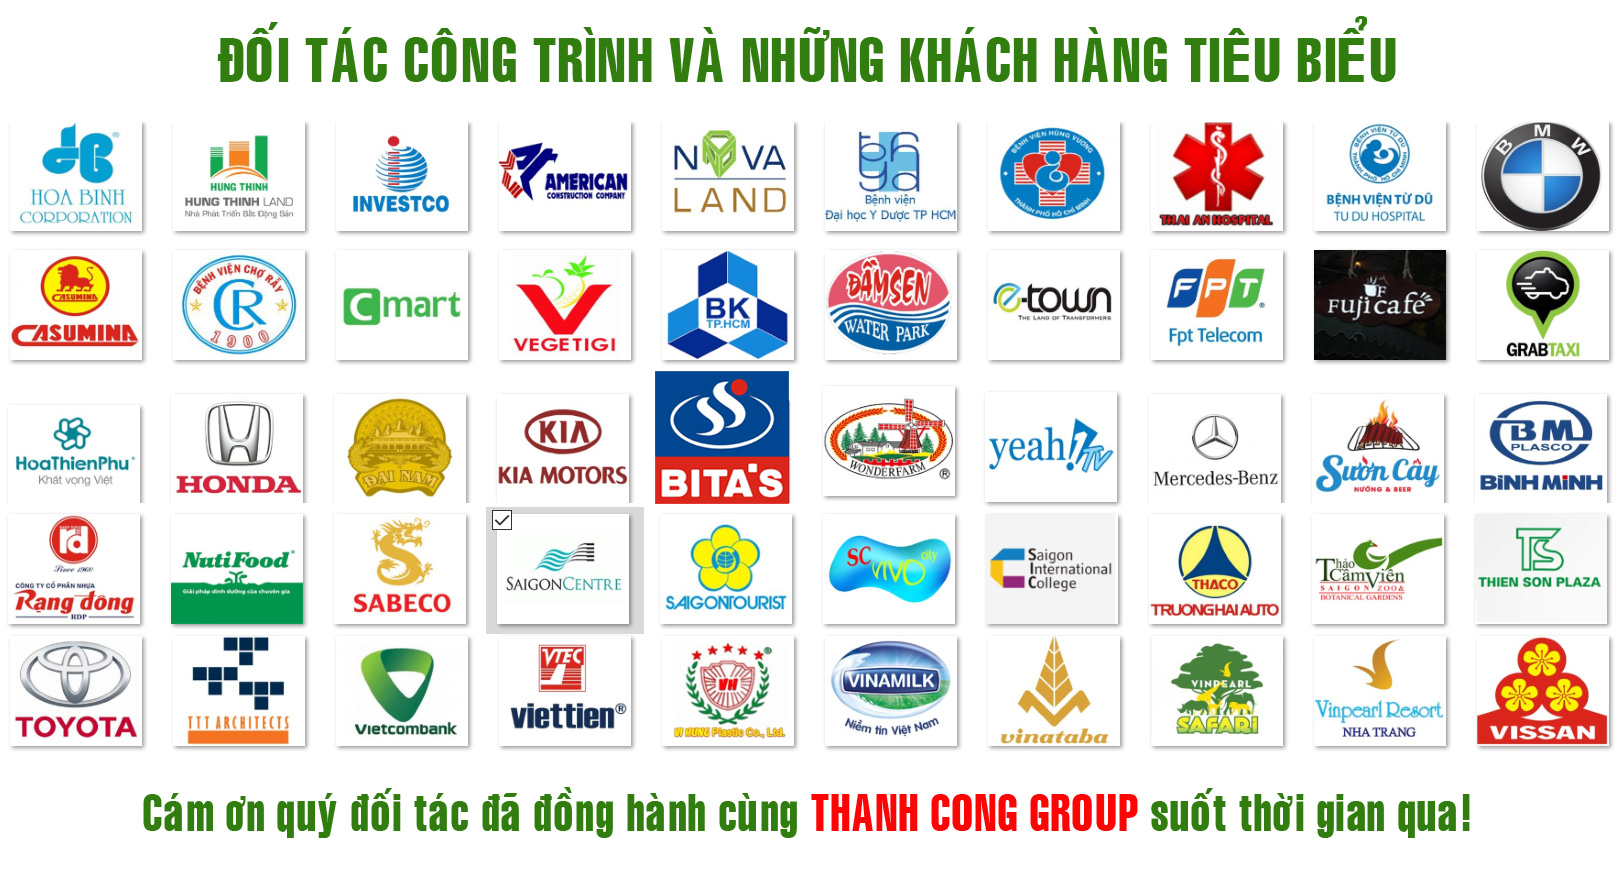 Khach hang Thanh Cong Group